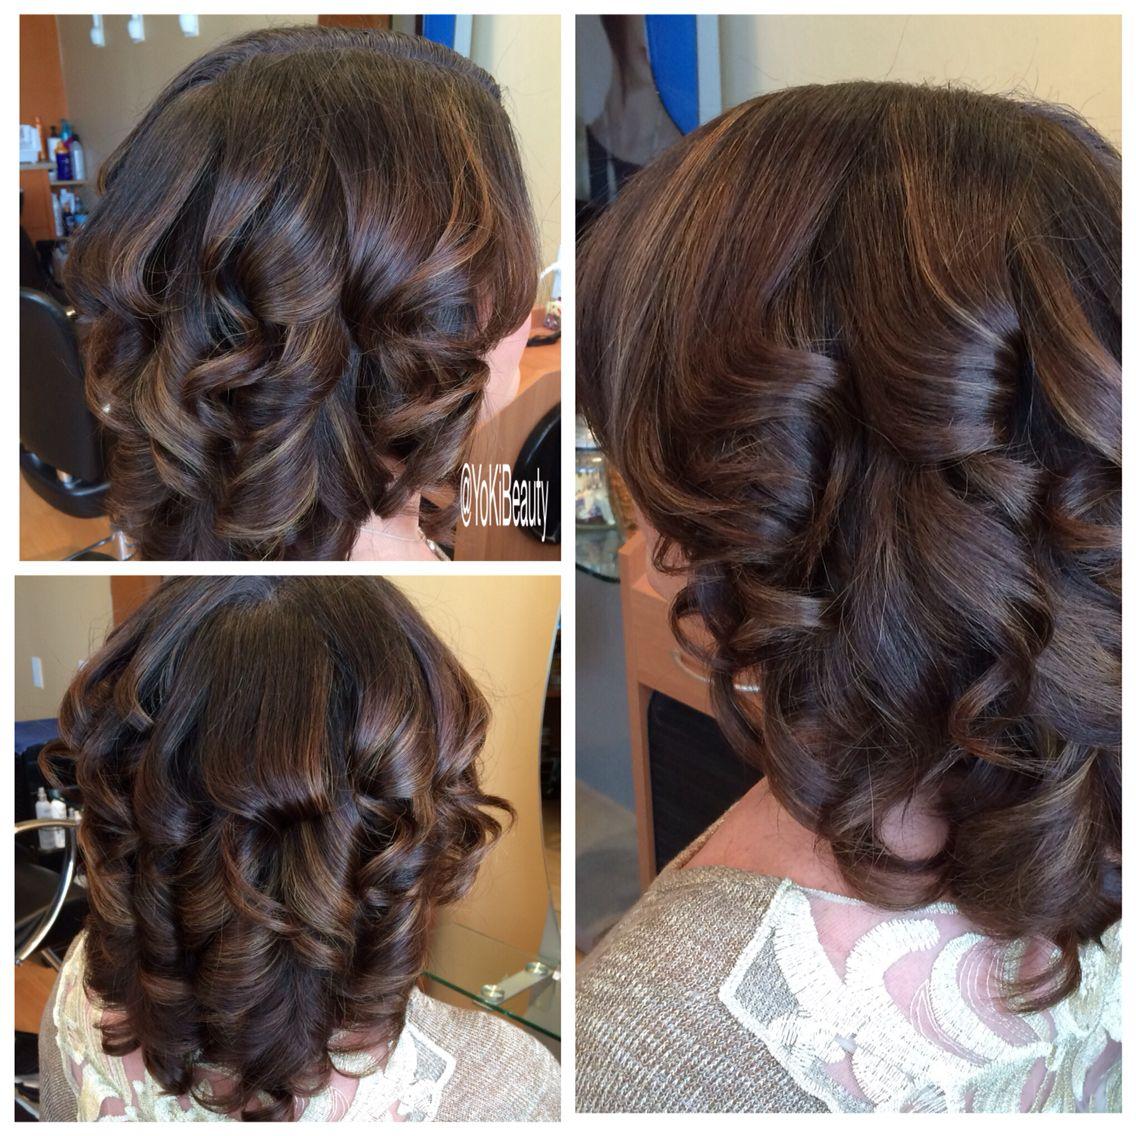 Cute Flat Iron Hairstyles Kids Hairstyles Black Kids Hairstyles Flat Iron Hair Styles